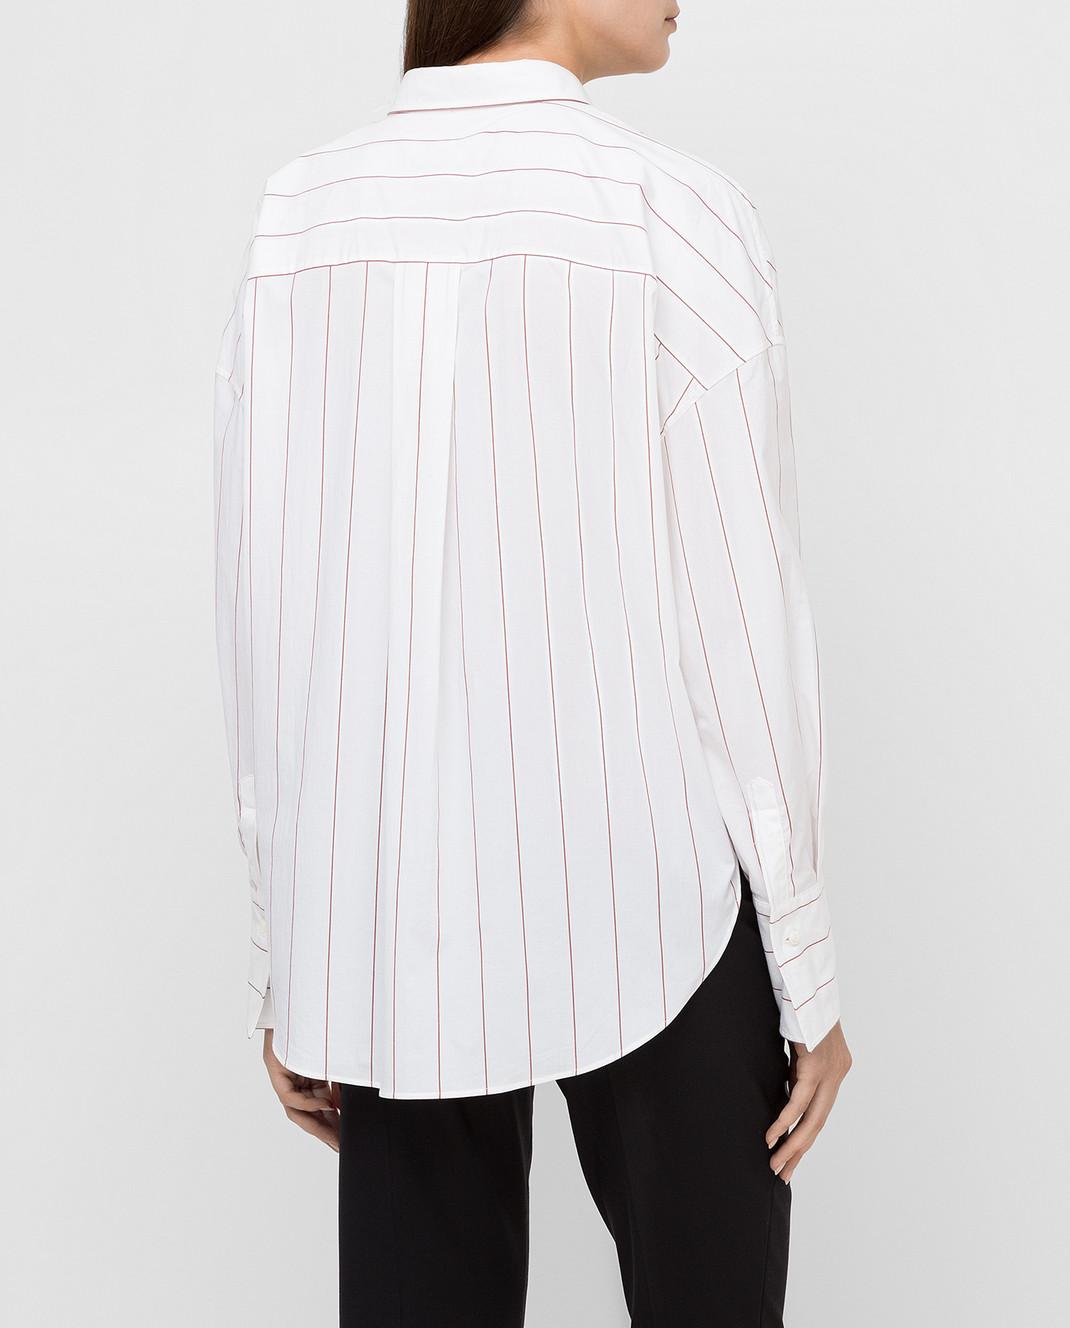 Brunello Cucinelli Белая рубашка MA731MF316 изображение 4